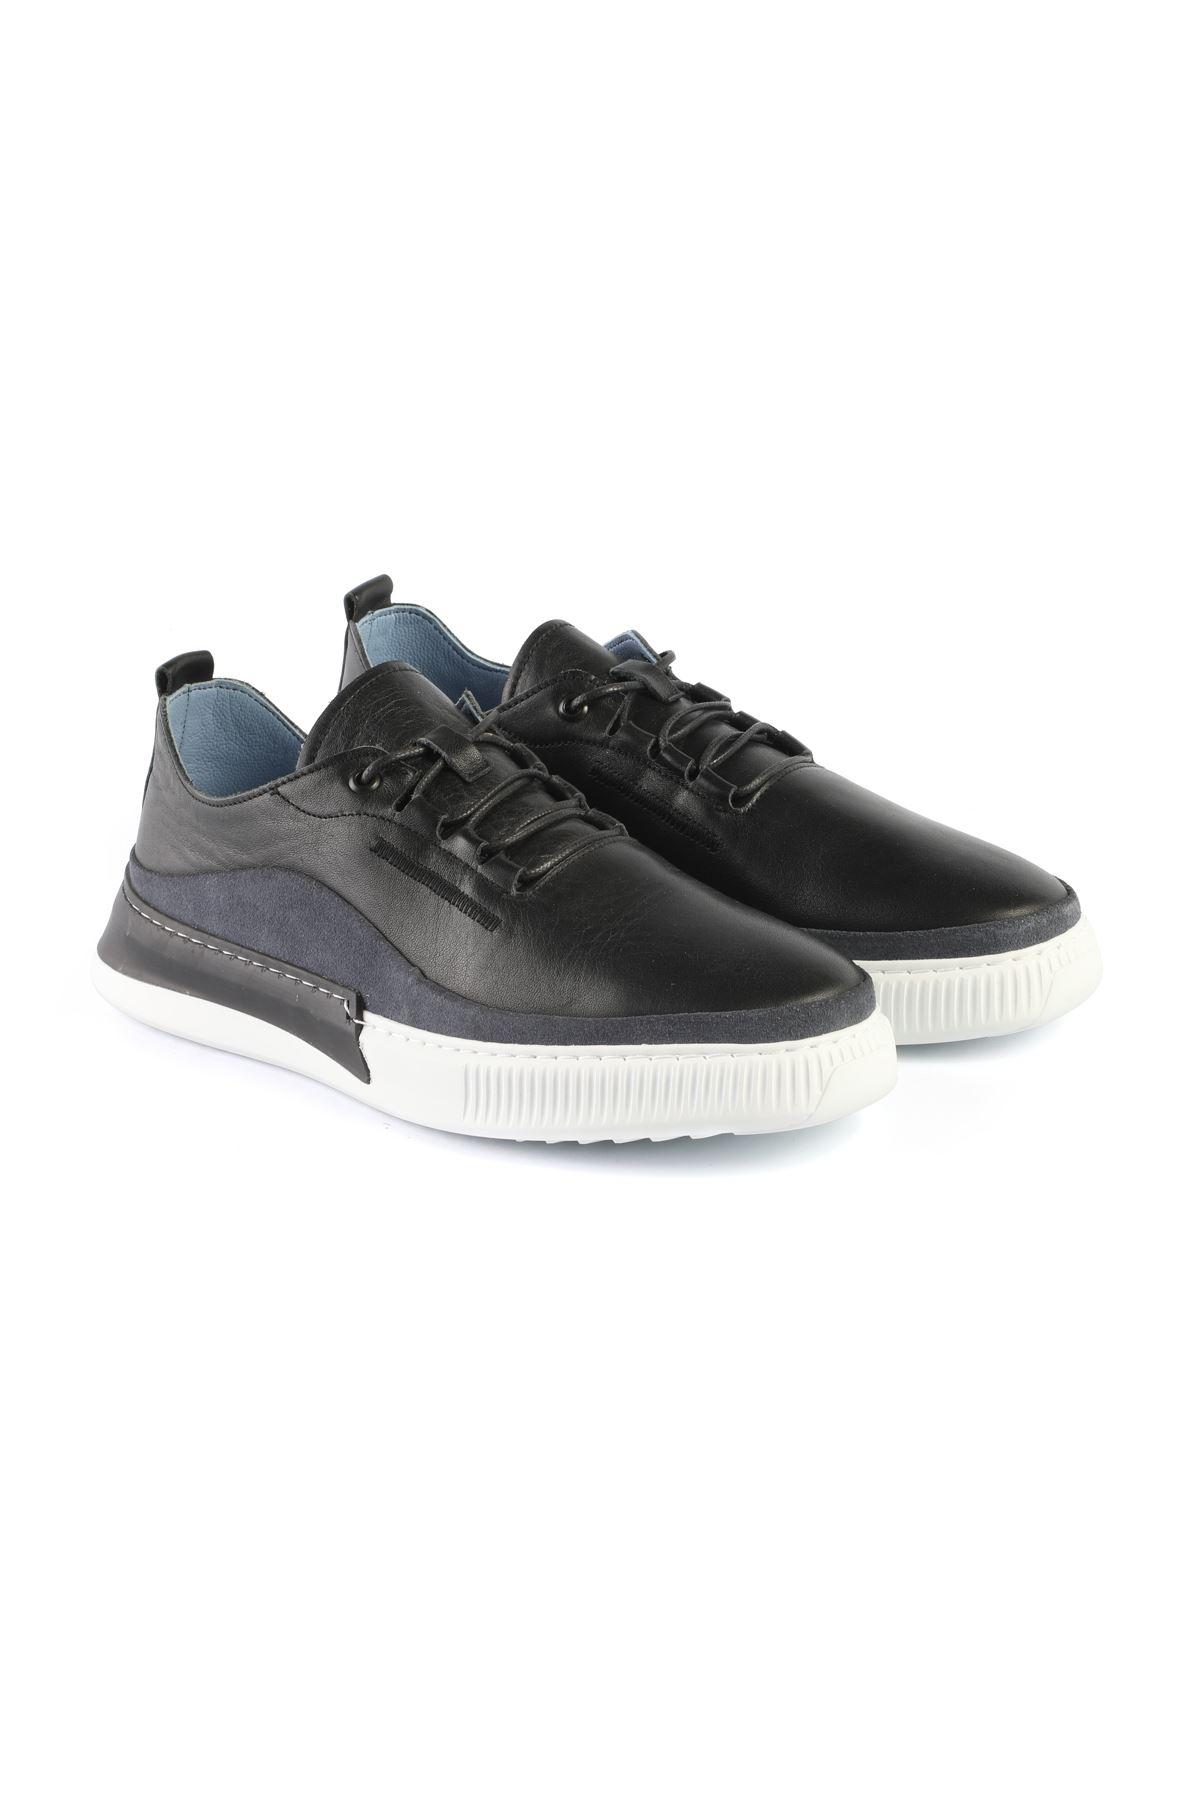 Libero L3400 Black Sneaker Shoes